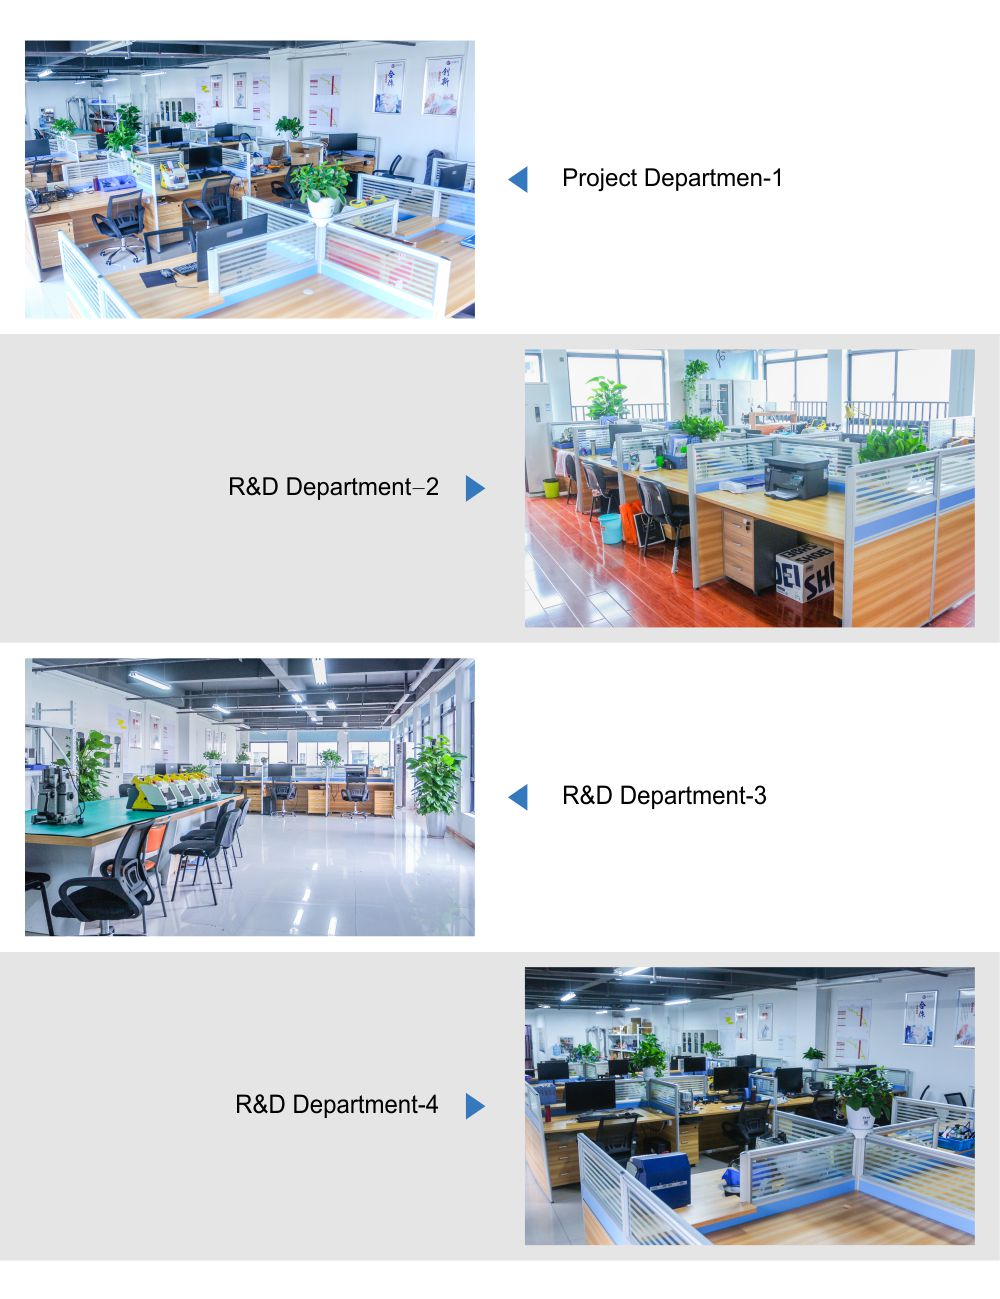 Product Development Department 研发部3